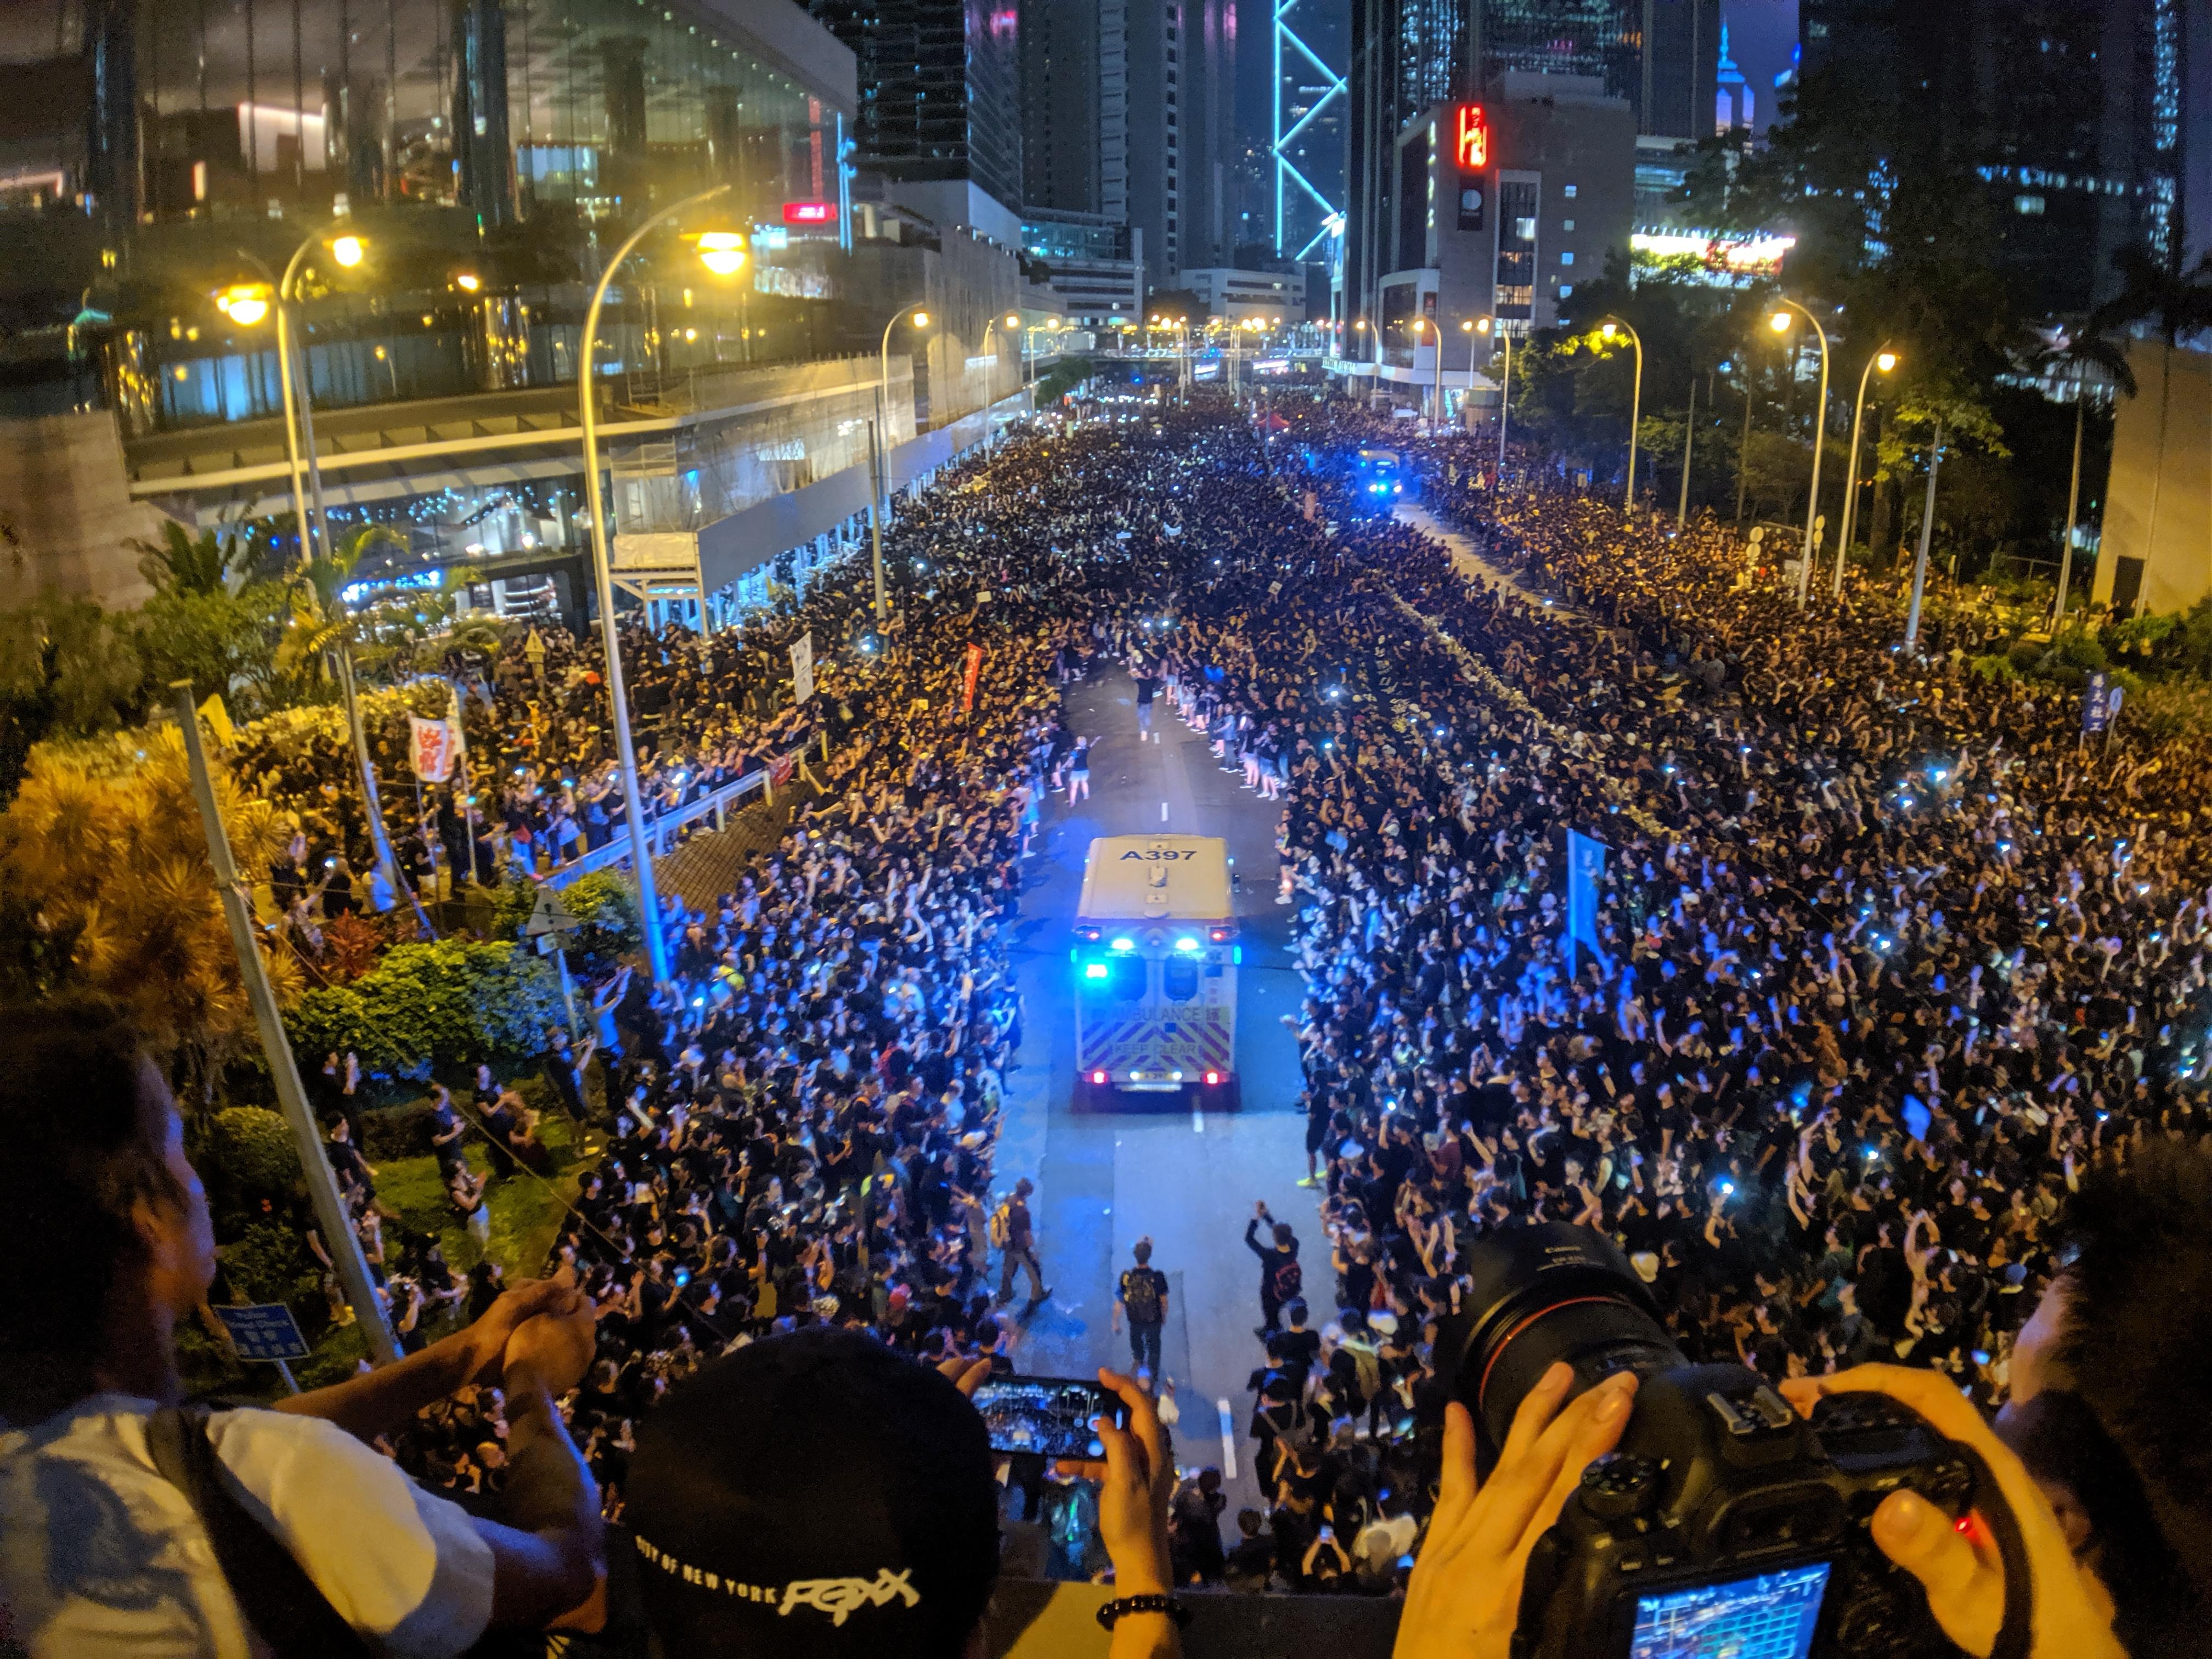 File:190616 HK Protest Incendo 17.jpg